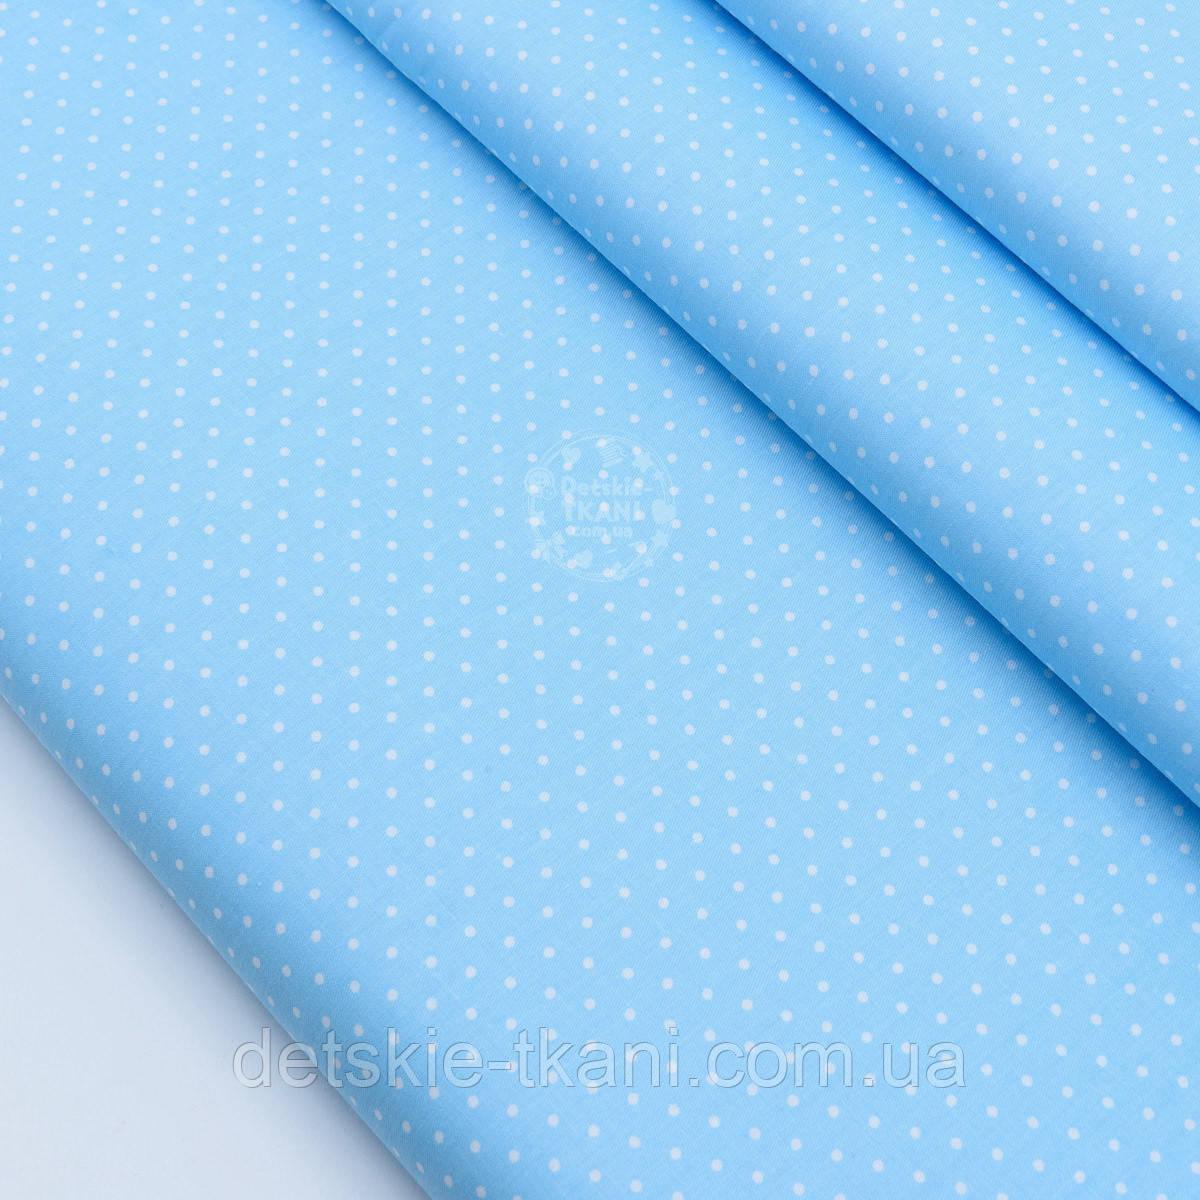 "Отрез сатина ткань ""Белые точки 2 мм"" на голубом №1794с, размер 80*160"